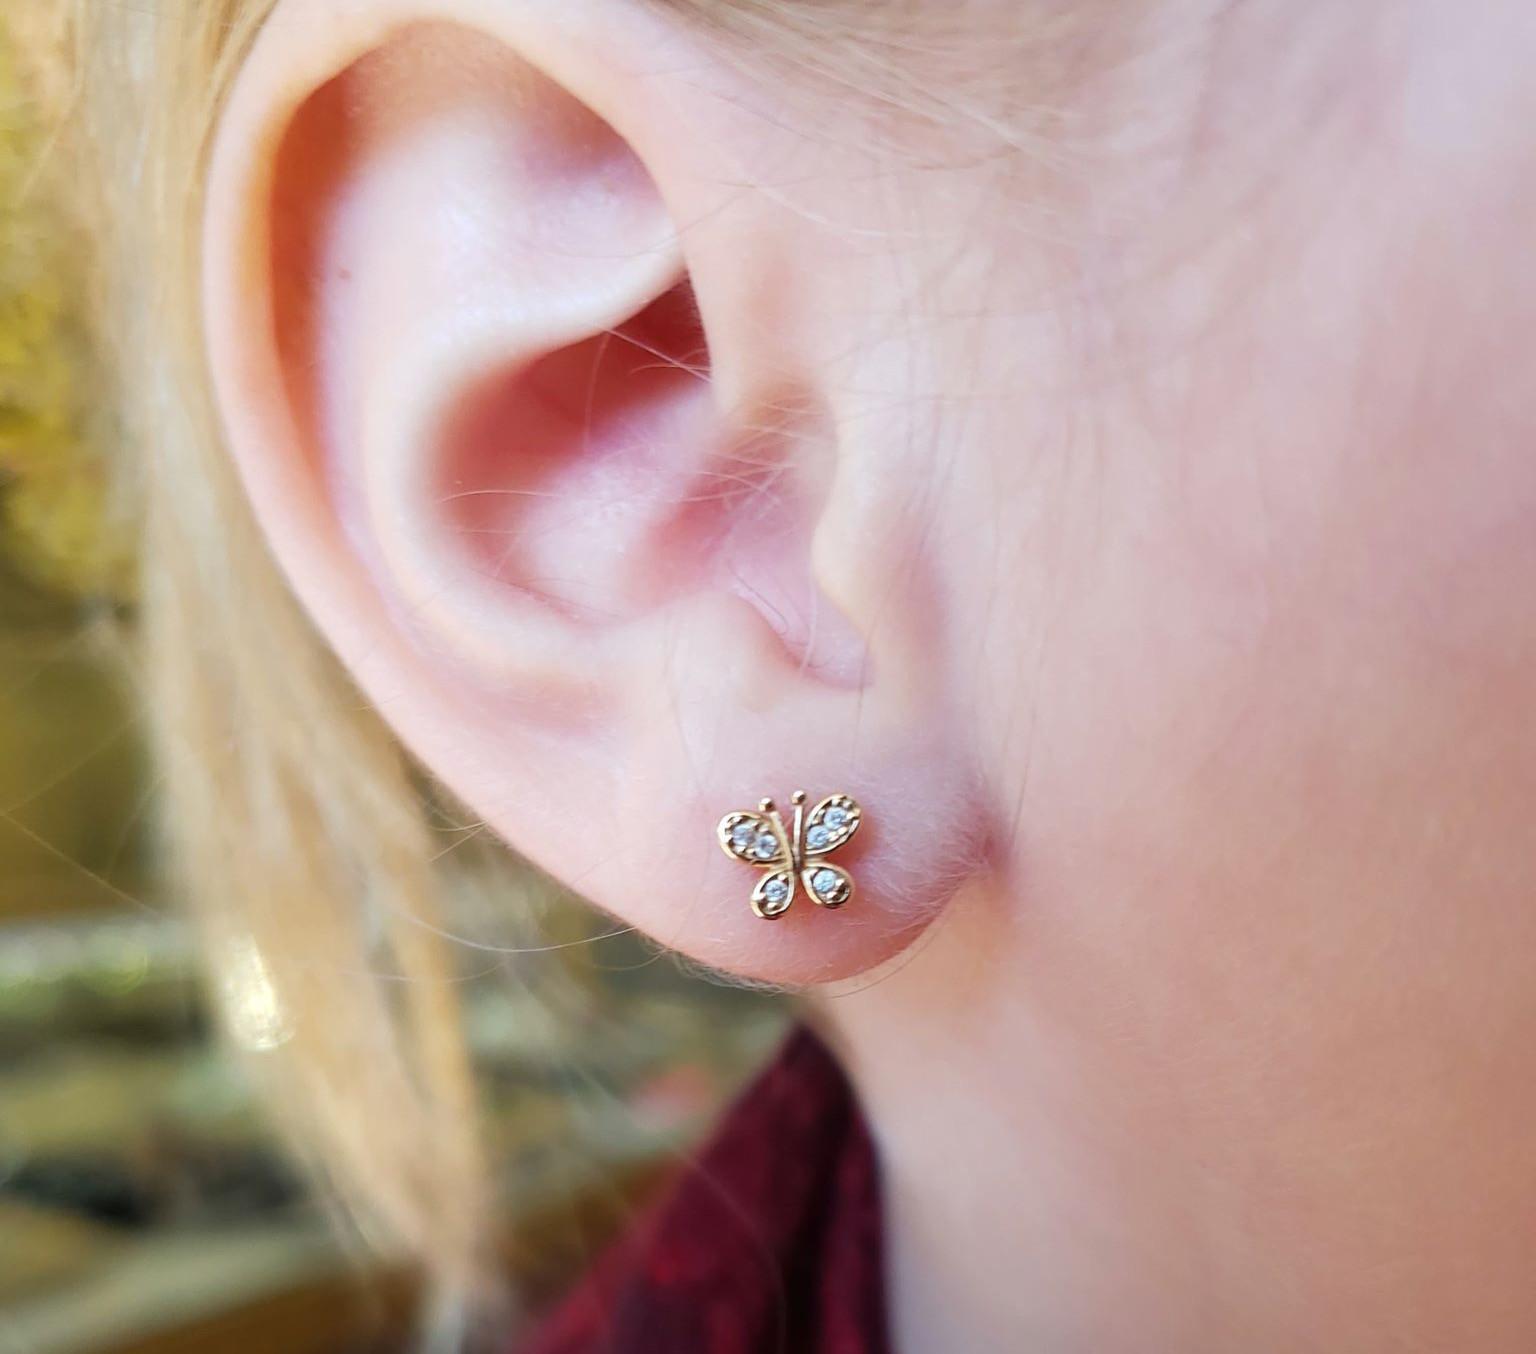 Single Lobe Piercing (ages 5-9)